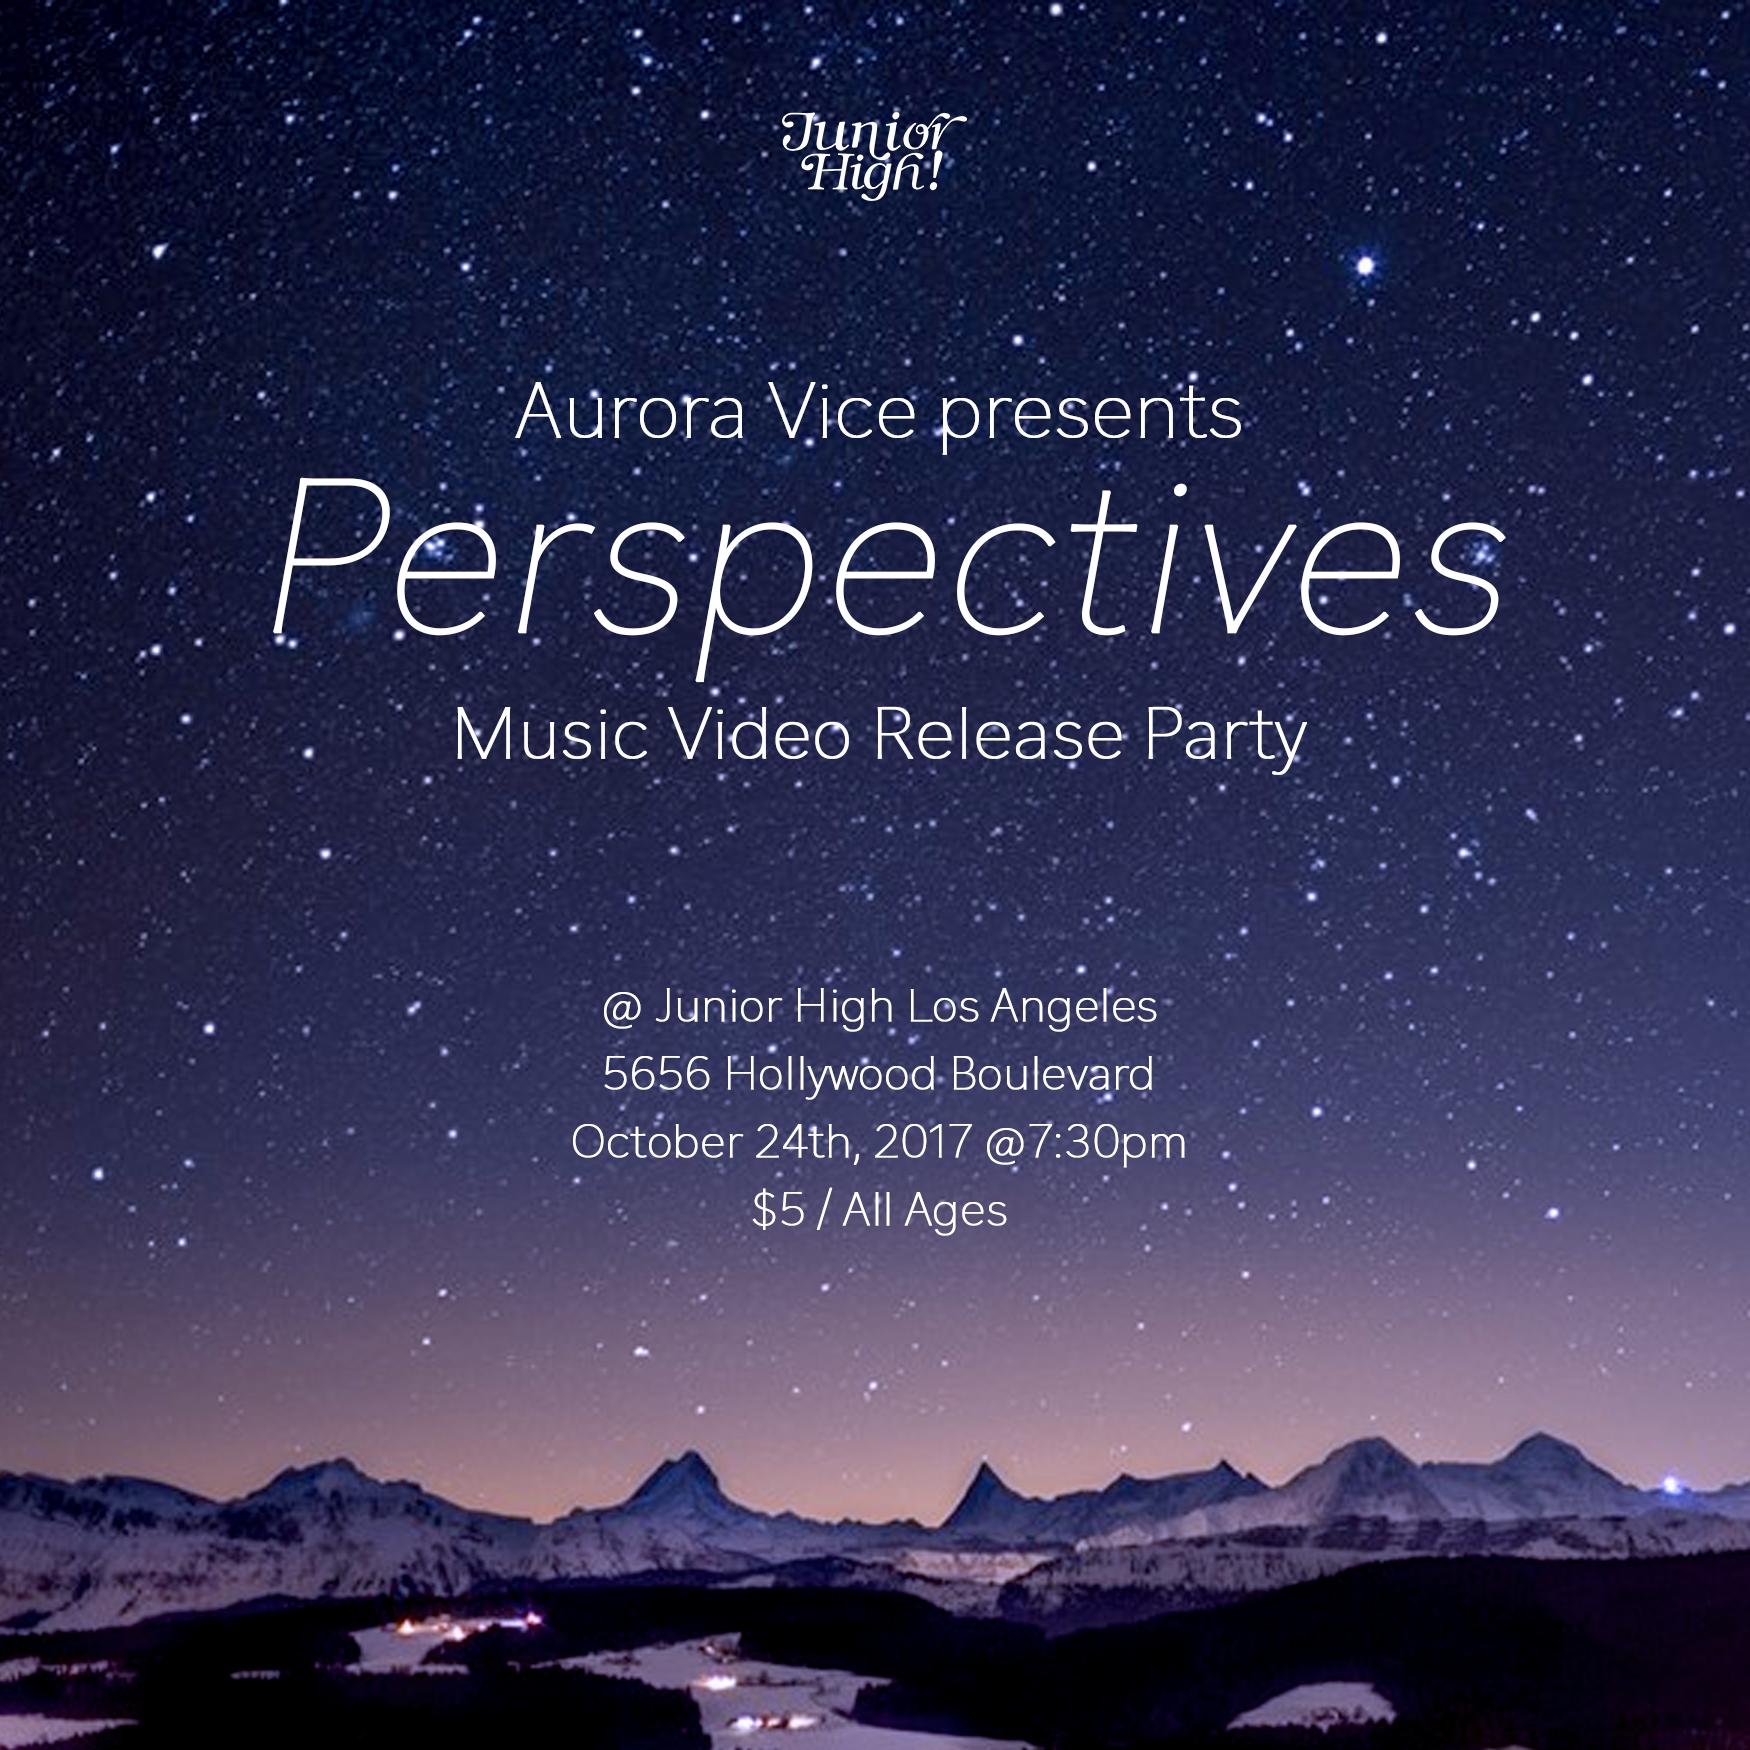 auroravice.jpg